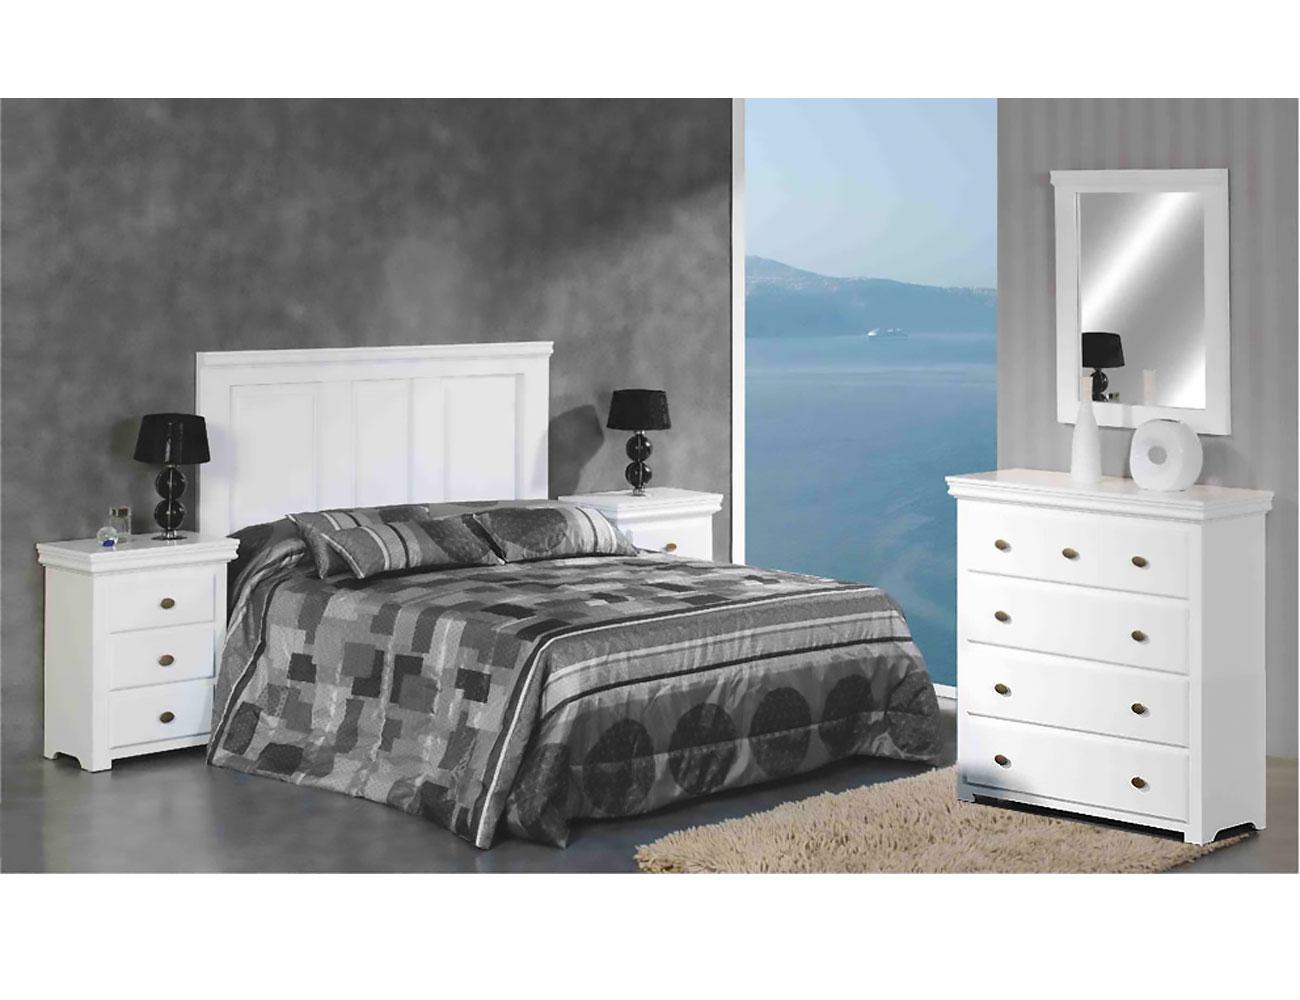 Dormitorio matrimonio comoda 5 c madera dm lacado blanco4